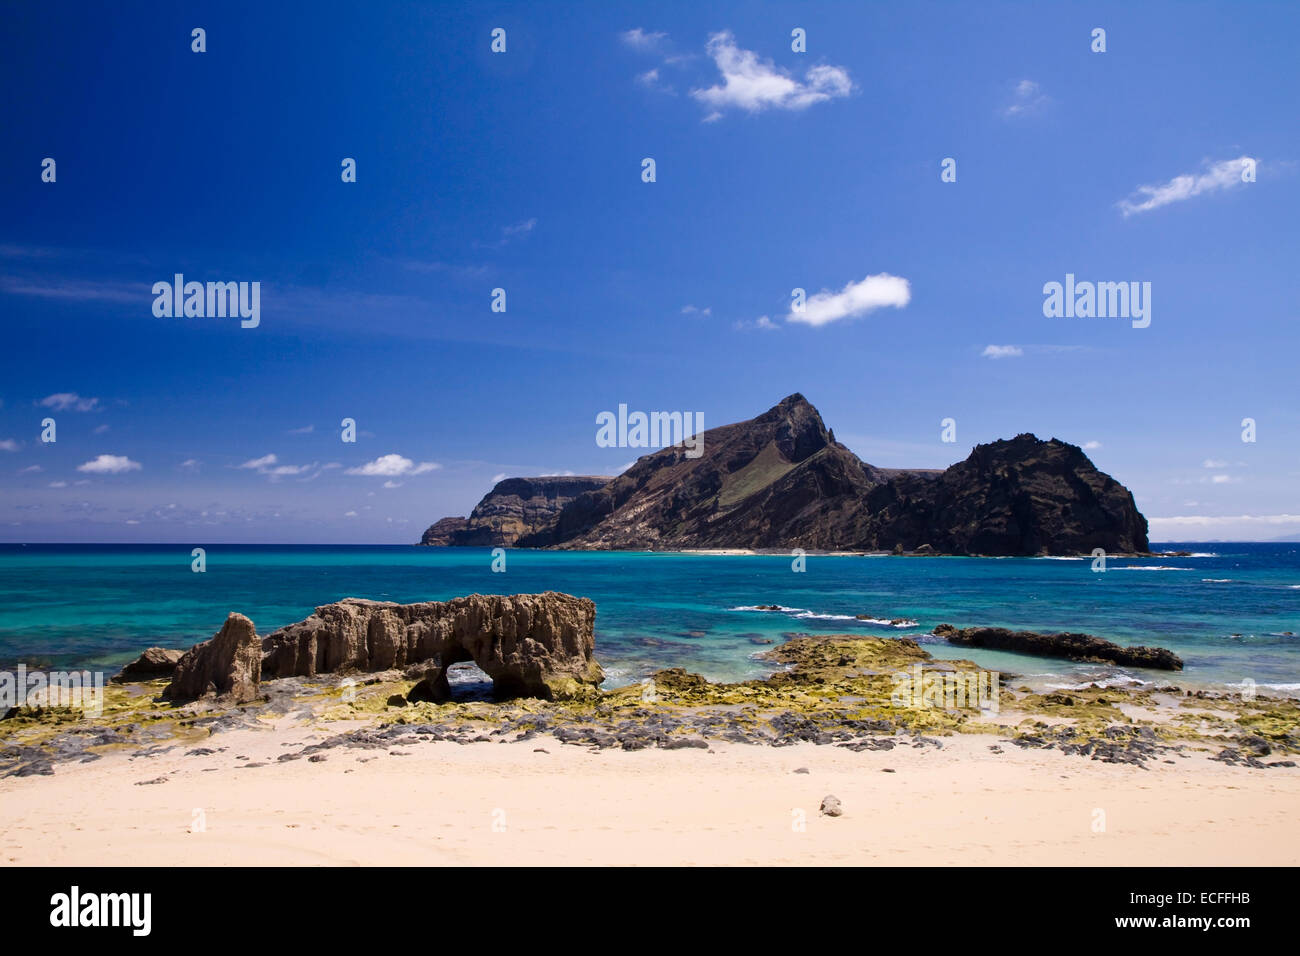 Ilheu da Cal island, Porto Santo, Madeira, Portugal Stock Photo